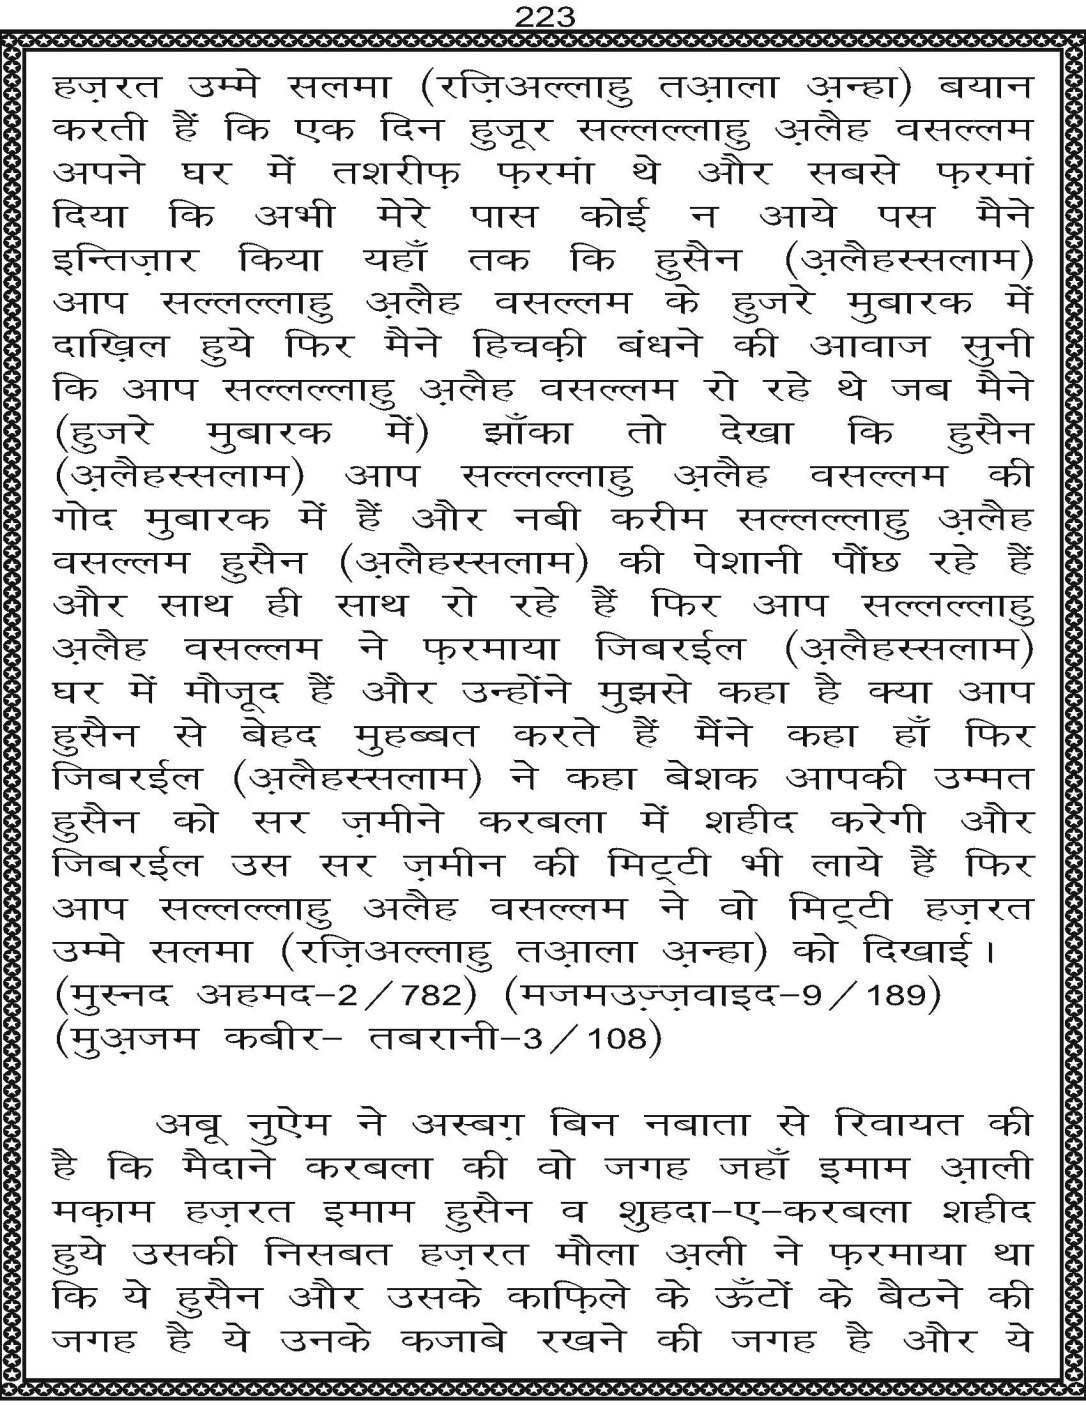 AzmateTaziyadari_Page_223